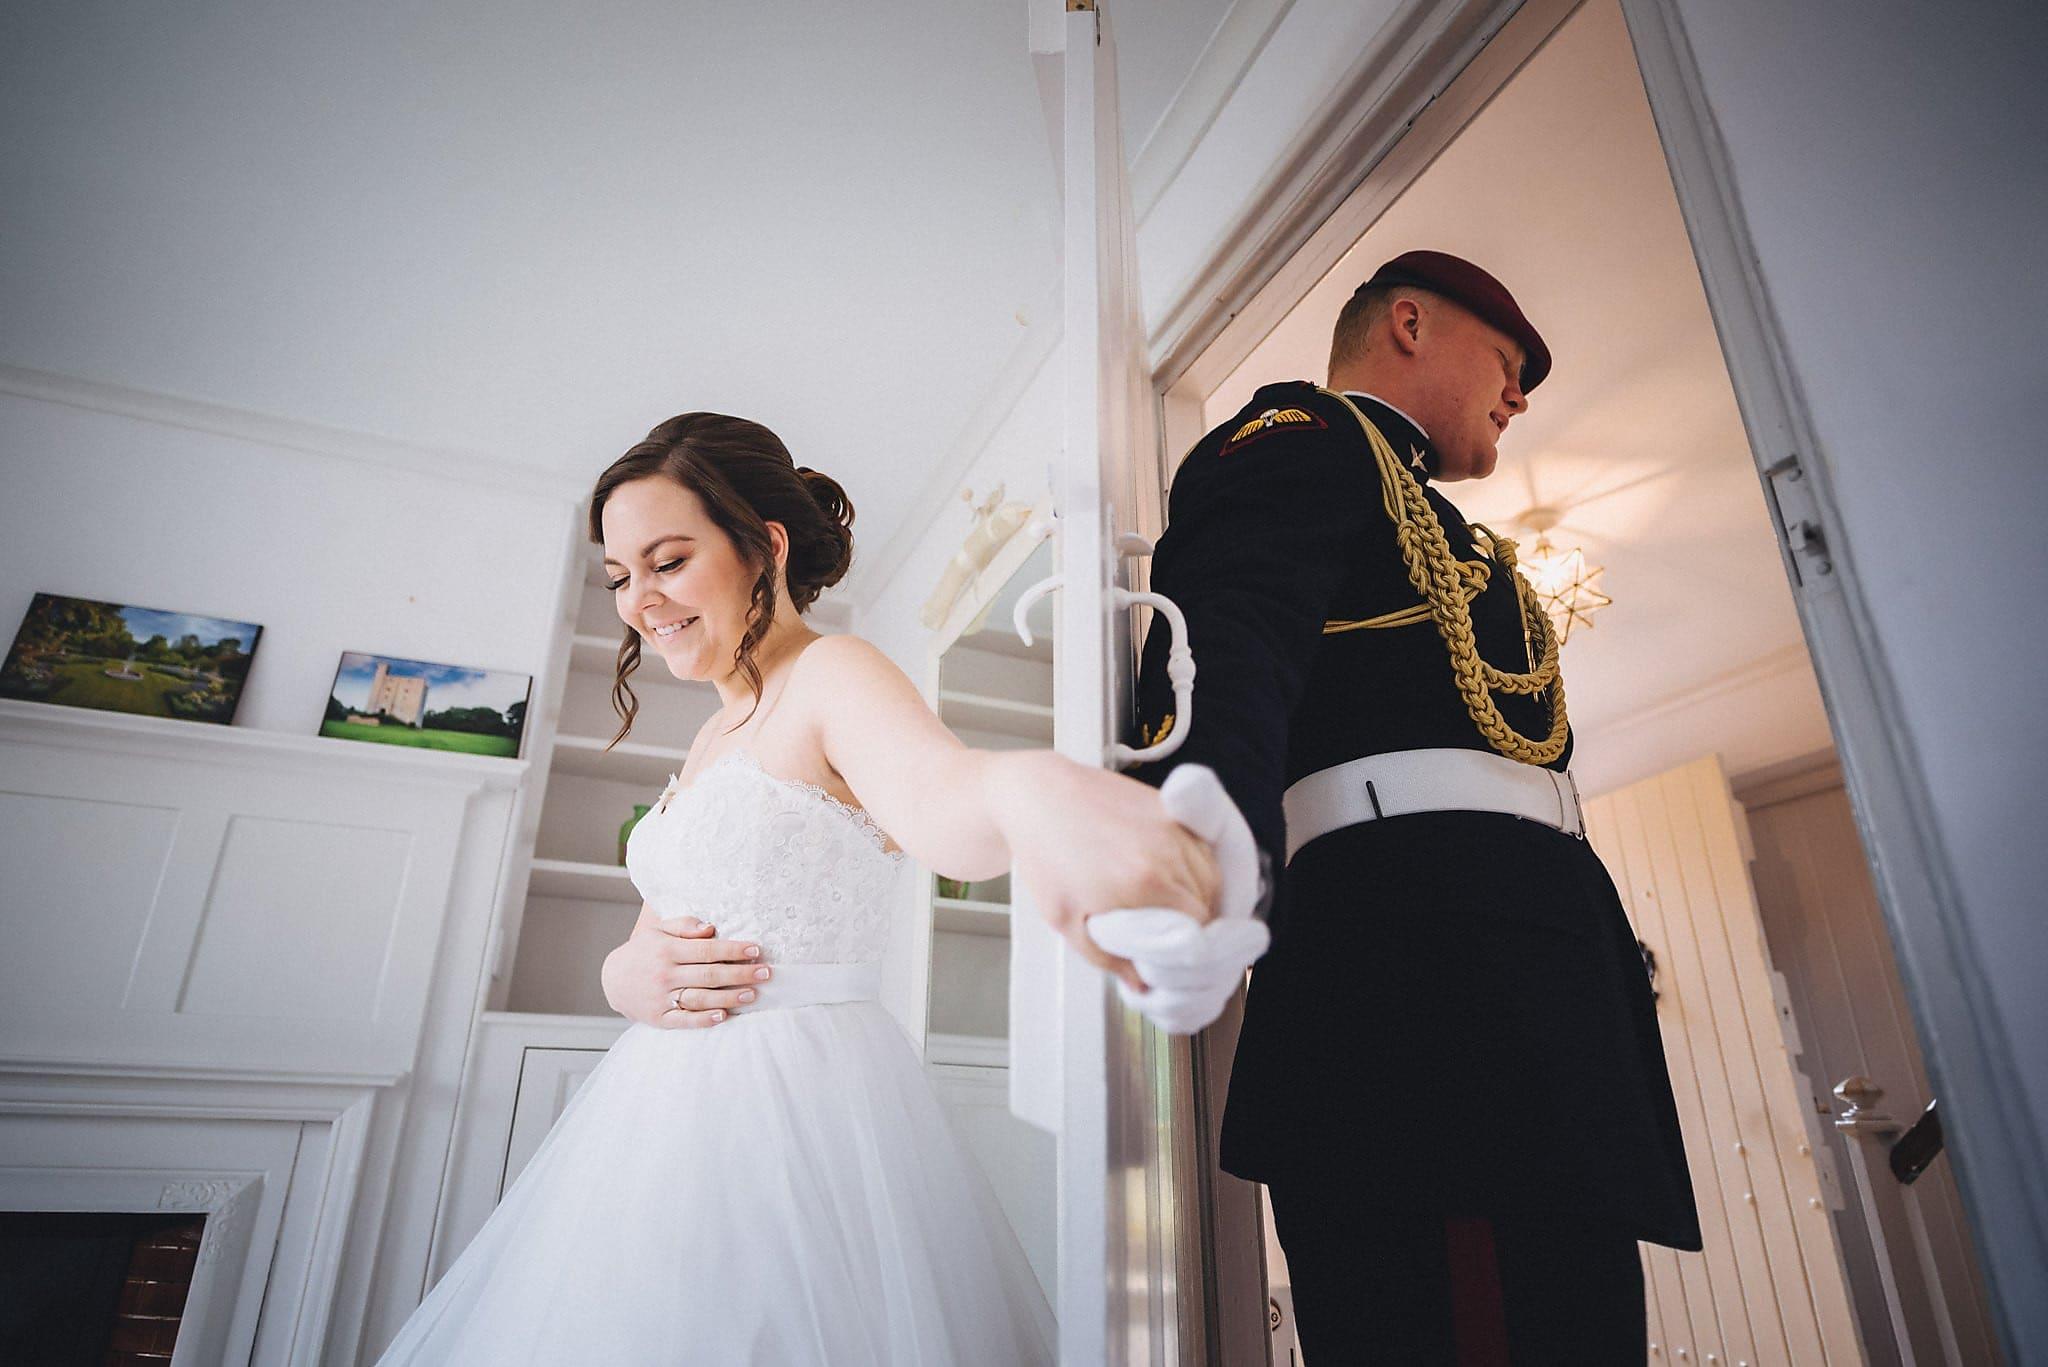 Heddingham Castle Wedding by Documentary Wedding Photographer Maria Assia Photography